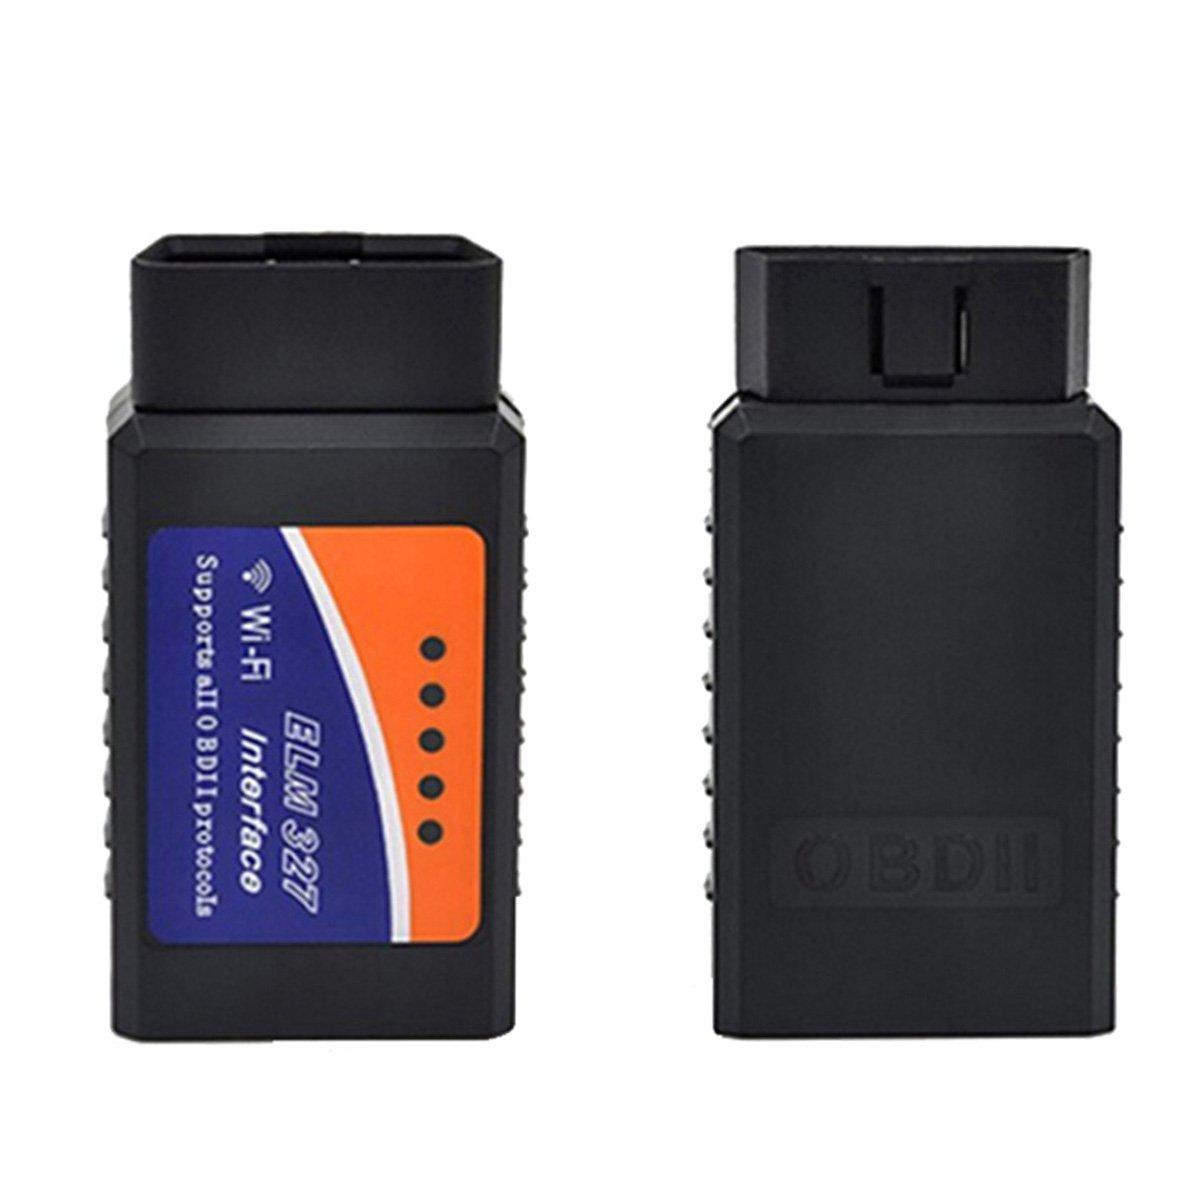 AVOLUTION Car Diagnostic Black Tool for Car DVD Phone